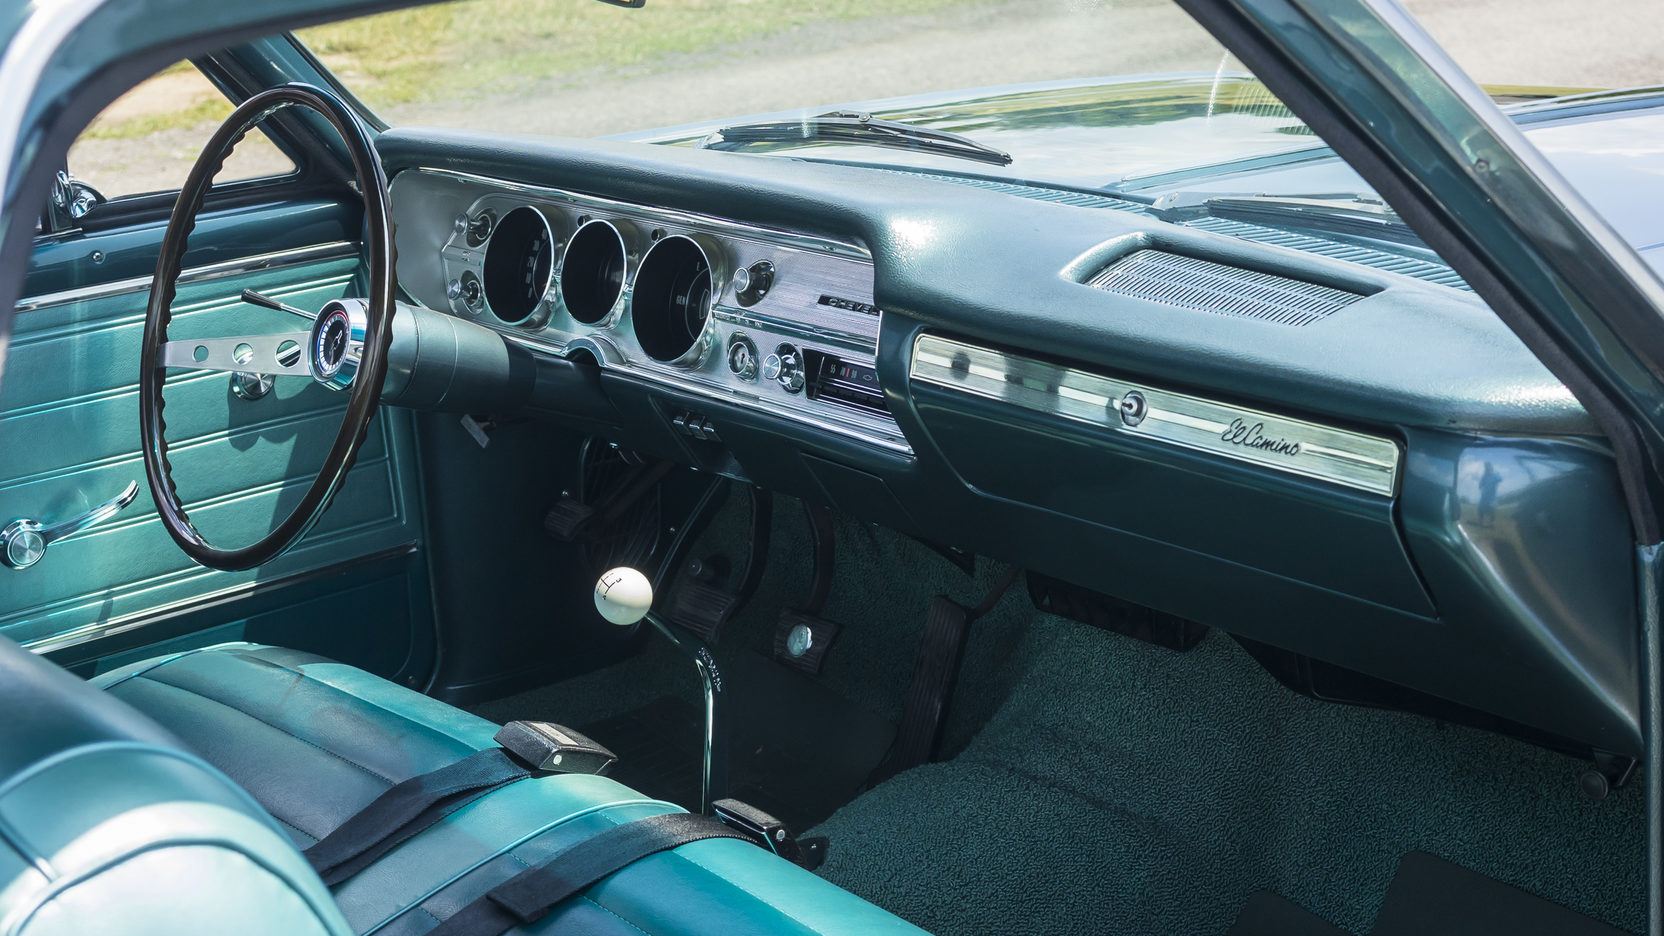 1965 Chevrolet El Camino interior passenger